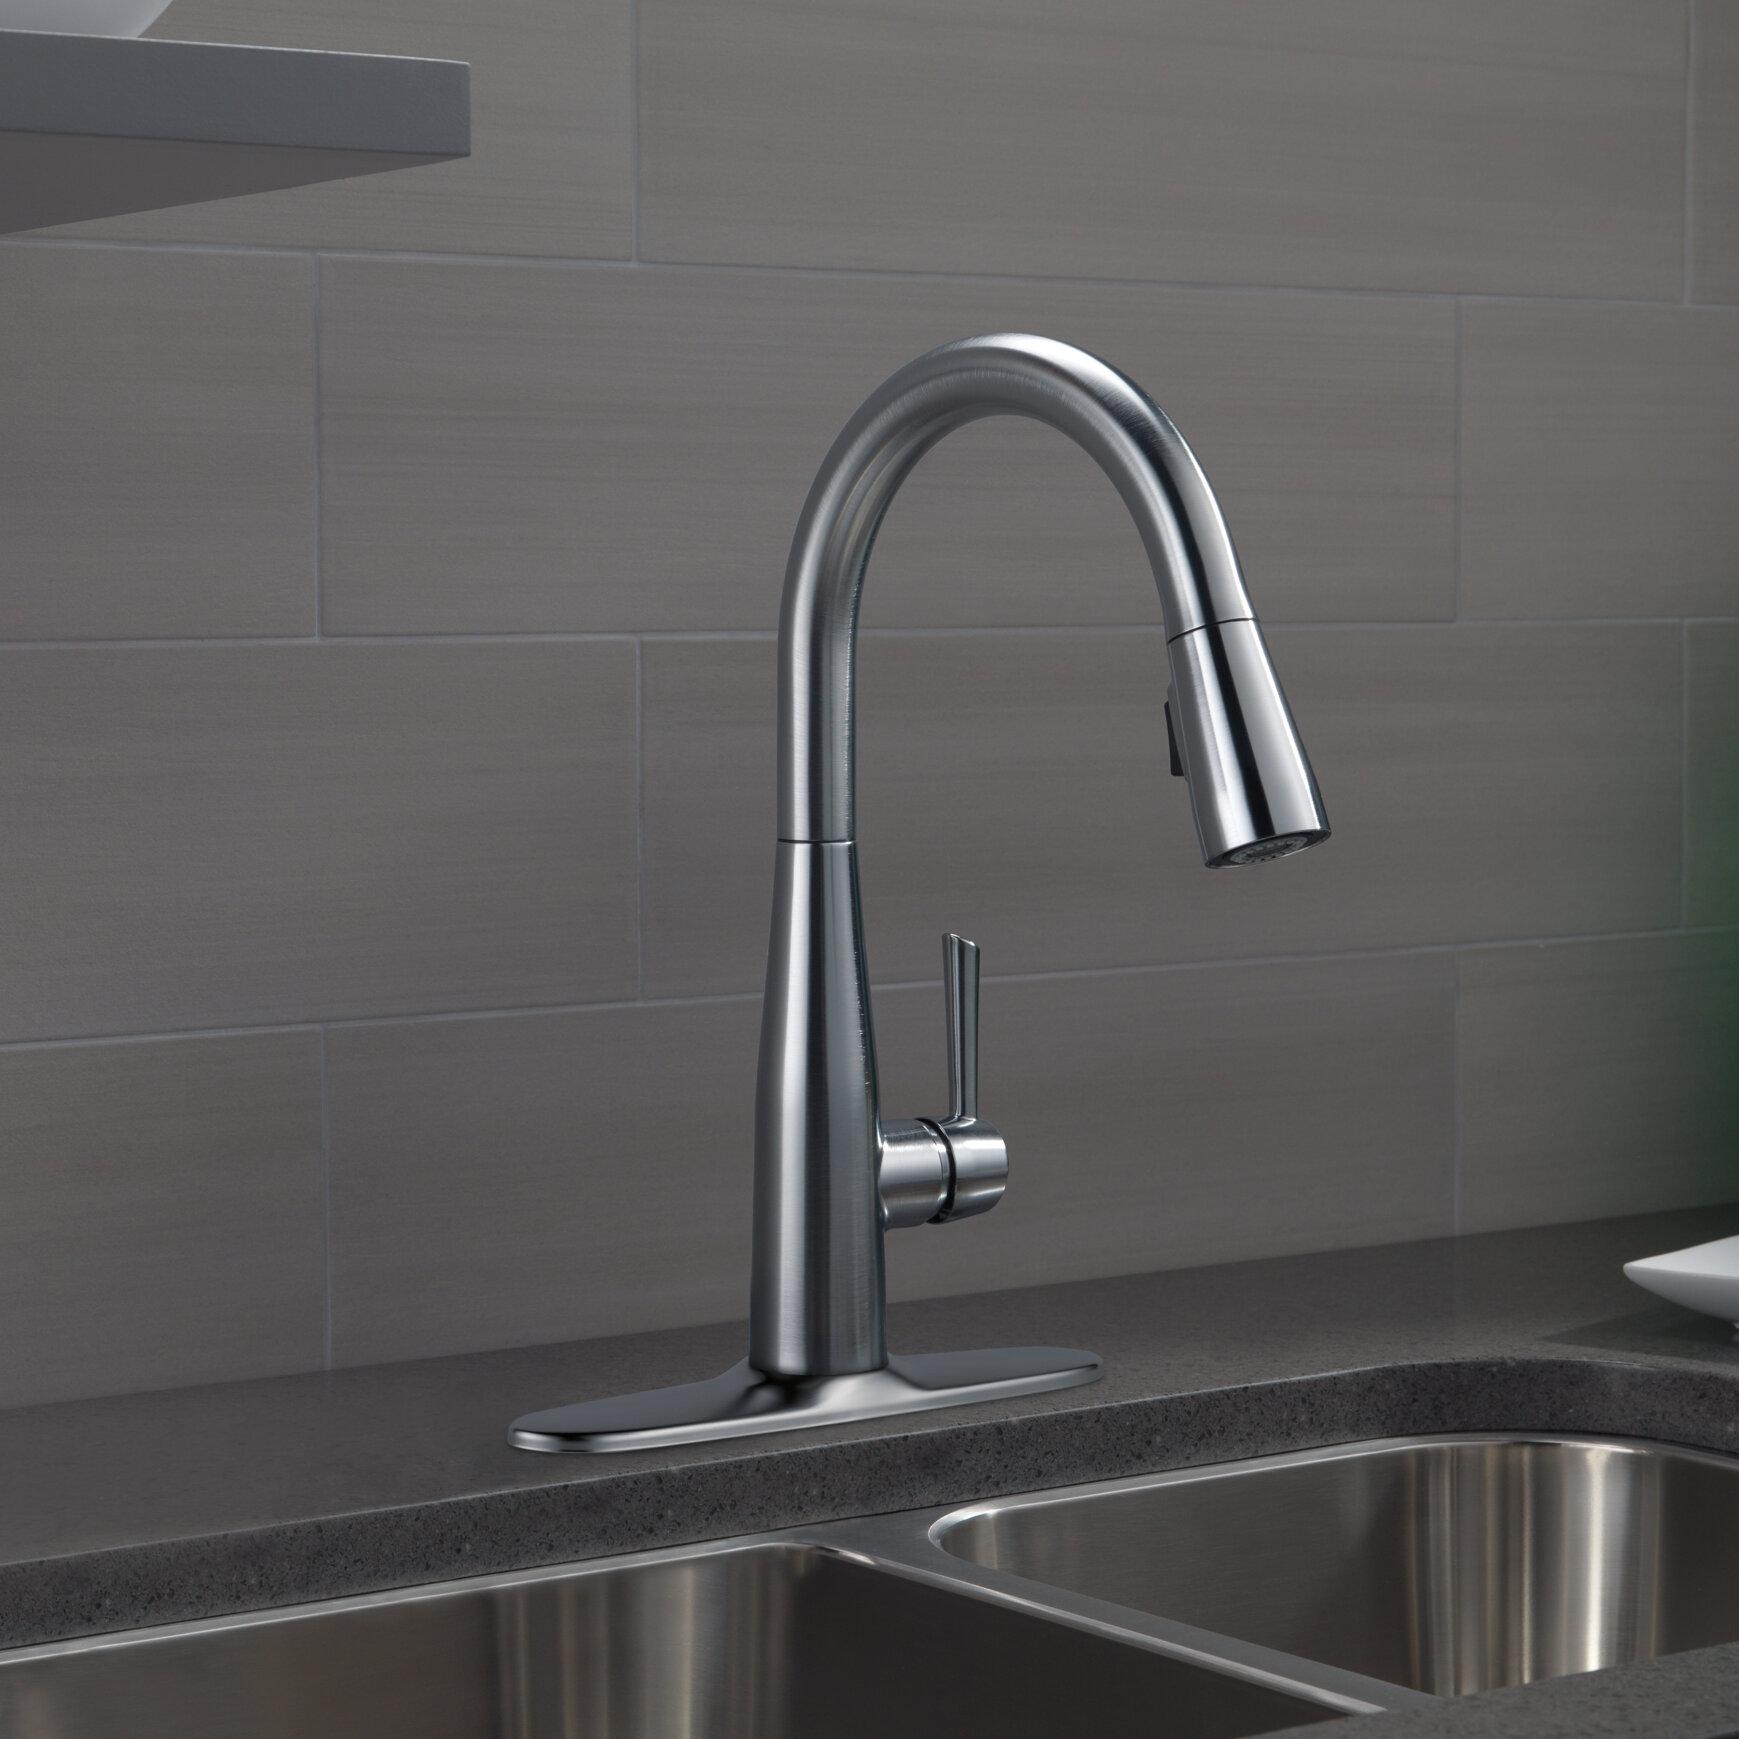 Long Reach Kitchen Faucets You Ll Love In 2020 Wayfair